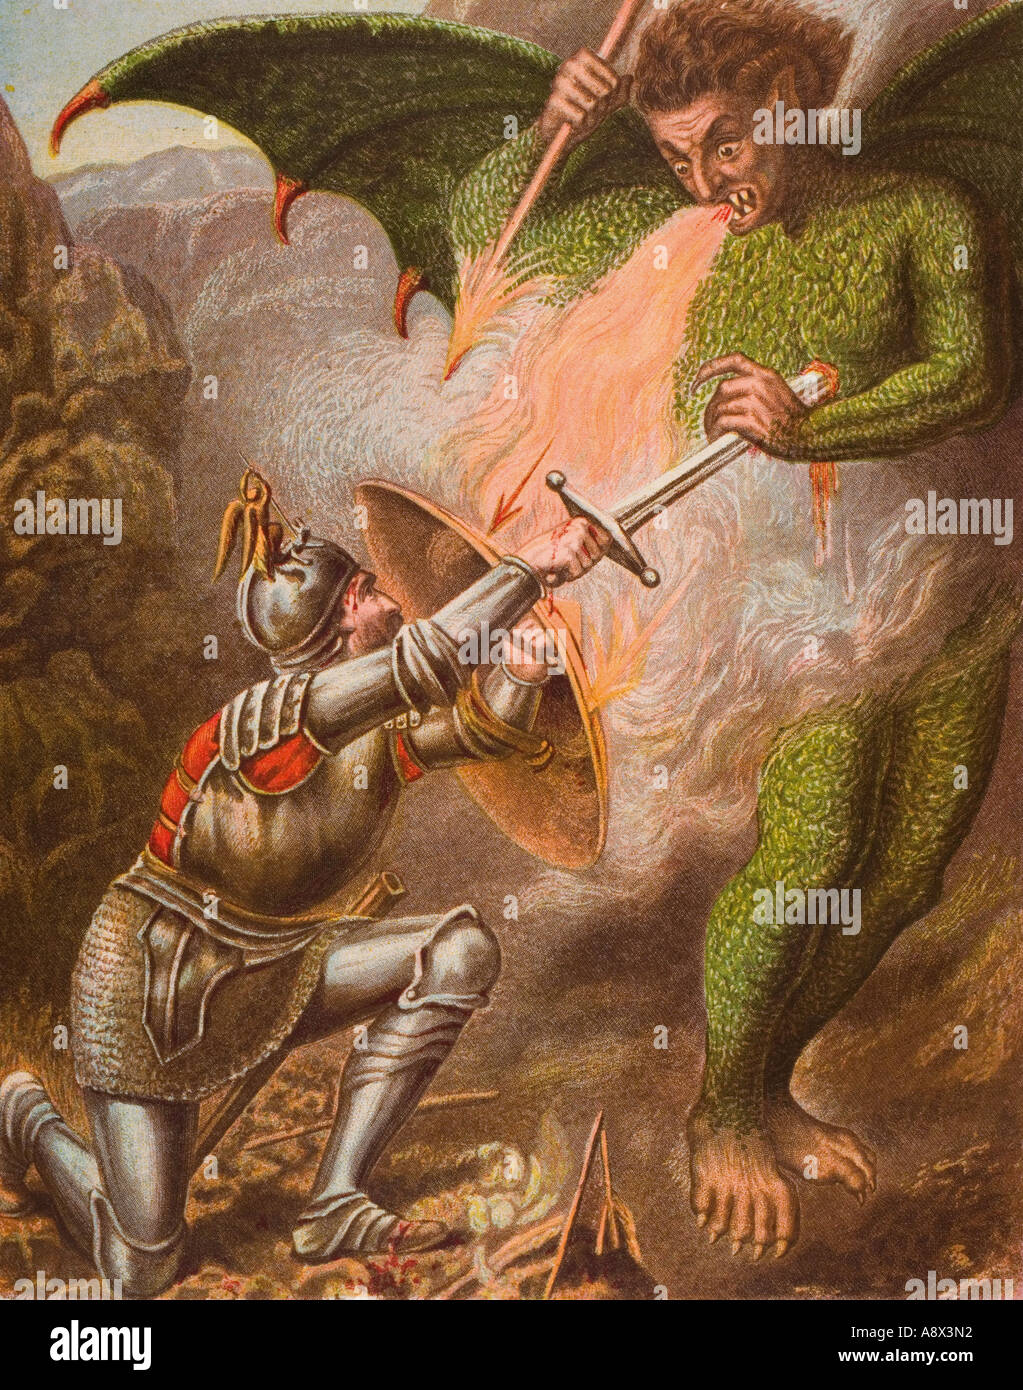 Christians Konflikt mit Apollyon, aus dem Buch The Pilgrim s Progress von John Bunyan, Ende des 19. Jahrhunderts Stockbild